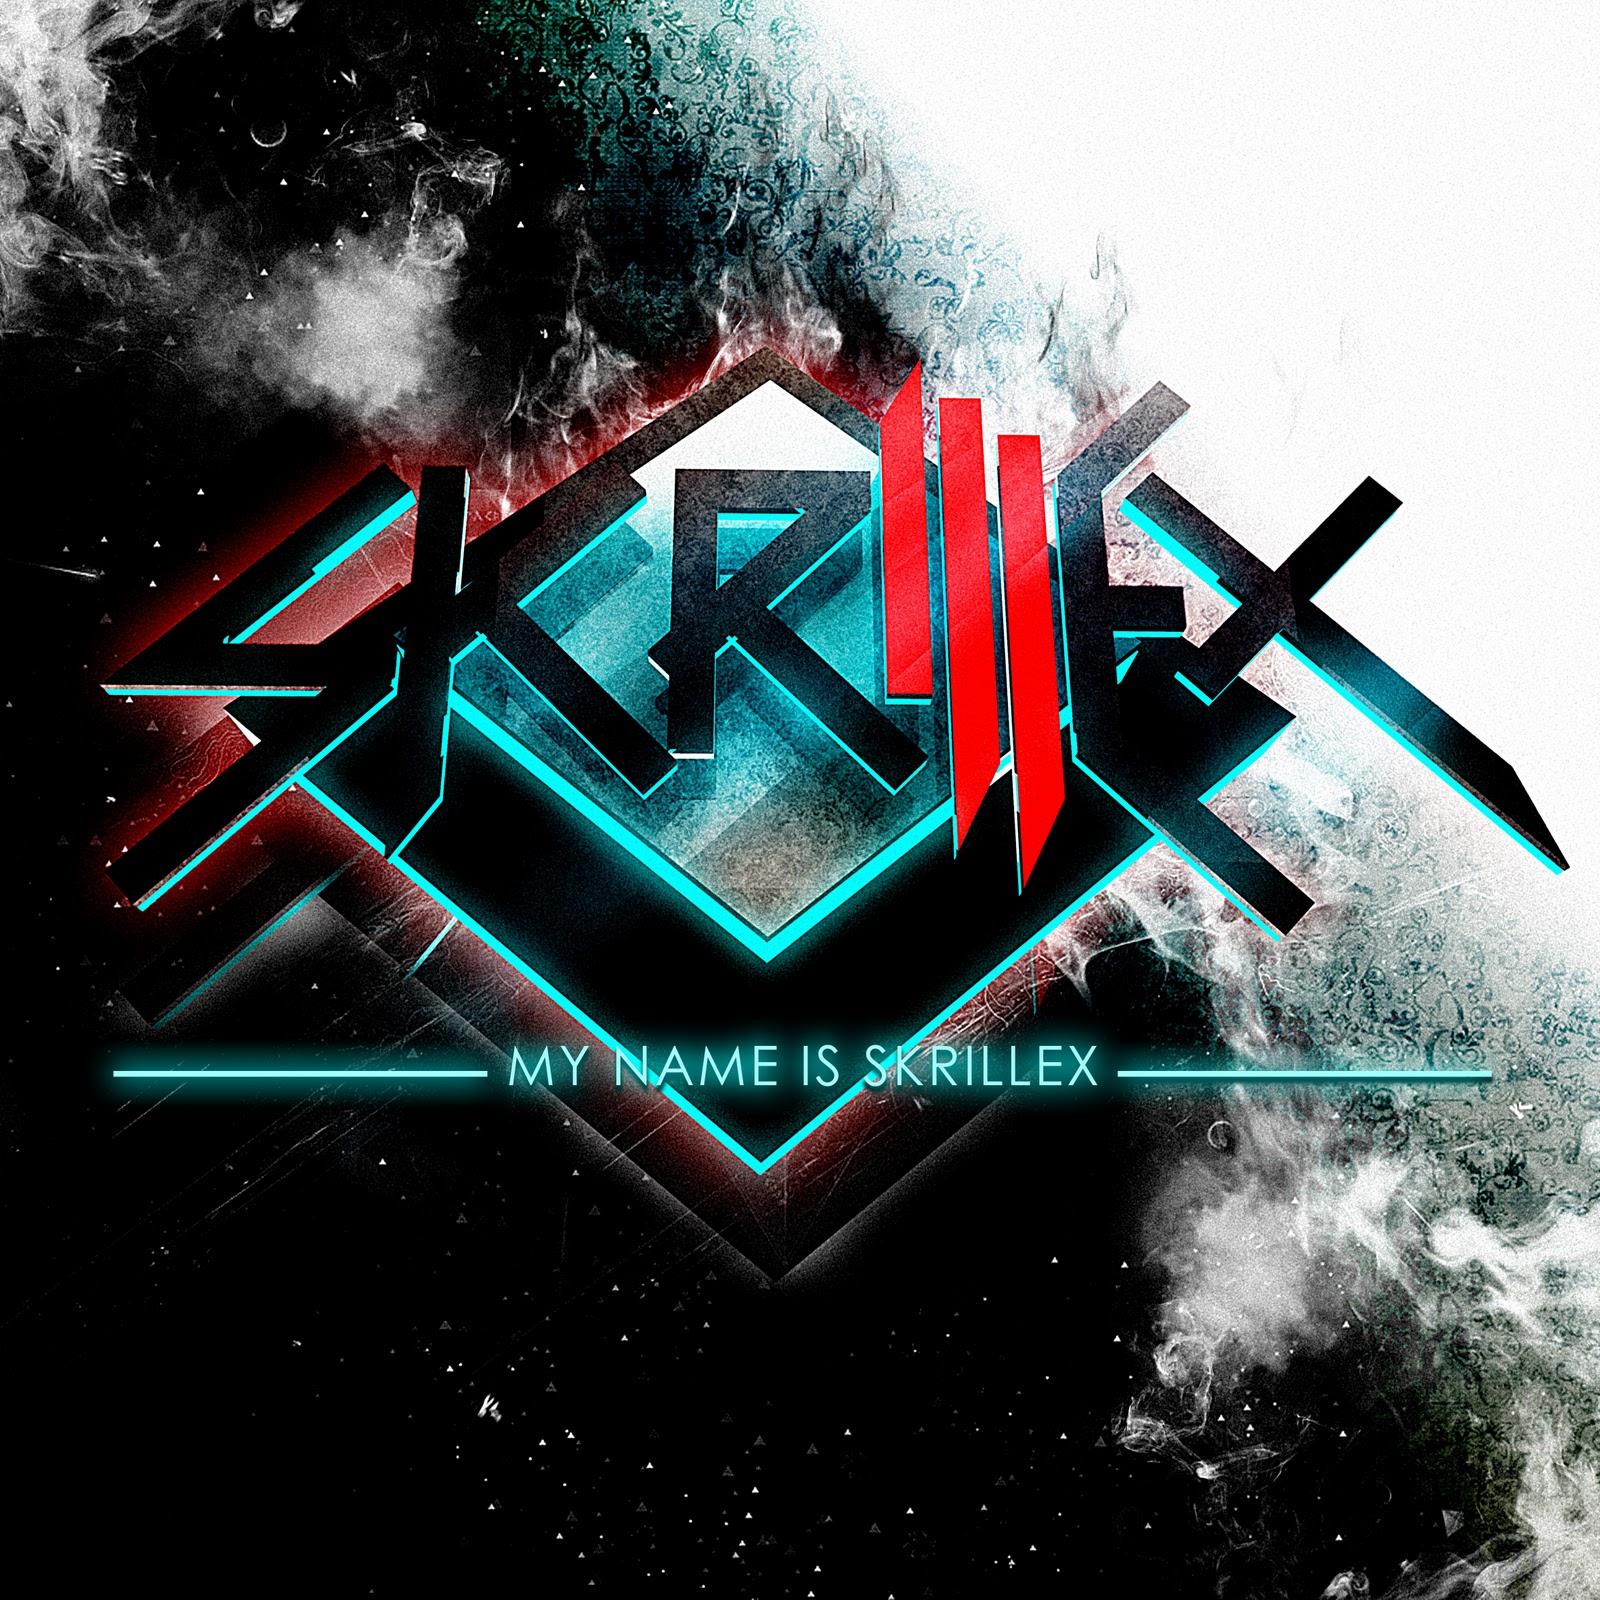 http://1.bp.blogspot.com/_GWaElVs0j68/TNGE8E21cTI/AAAAAAAAAIE/Pr1_lcgE6Tg/s1600/My+Name+Is+Skrillex+EP+1.jpg